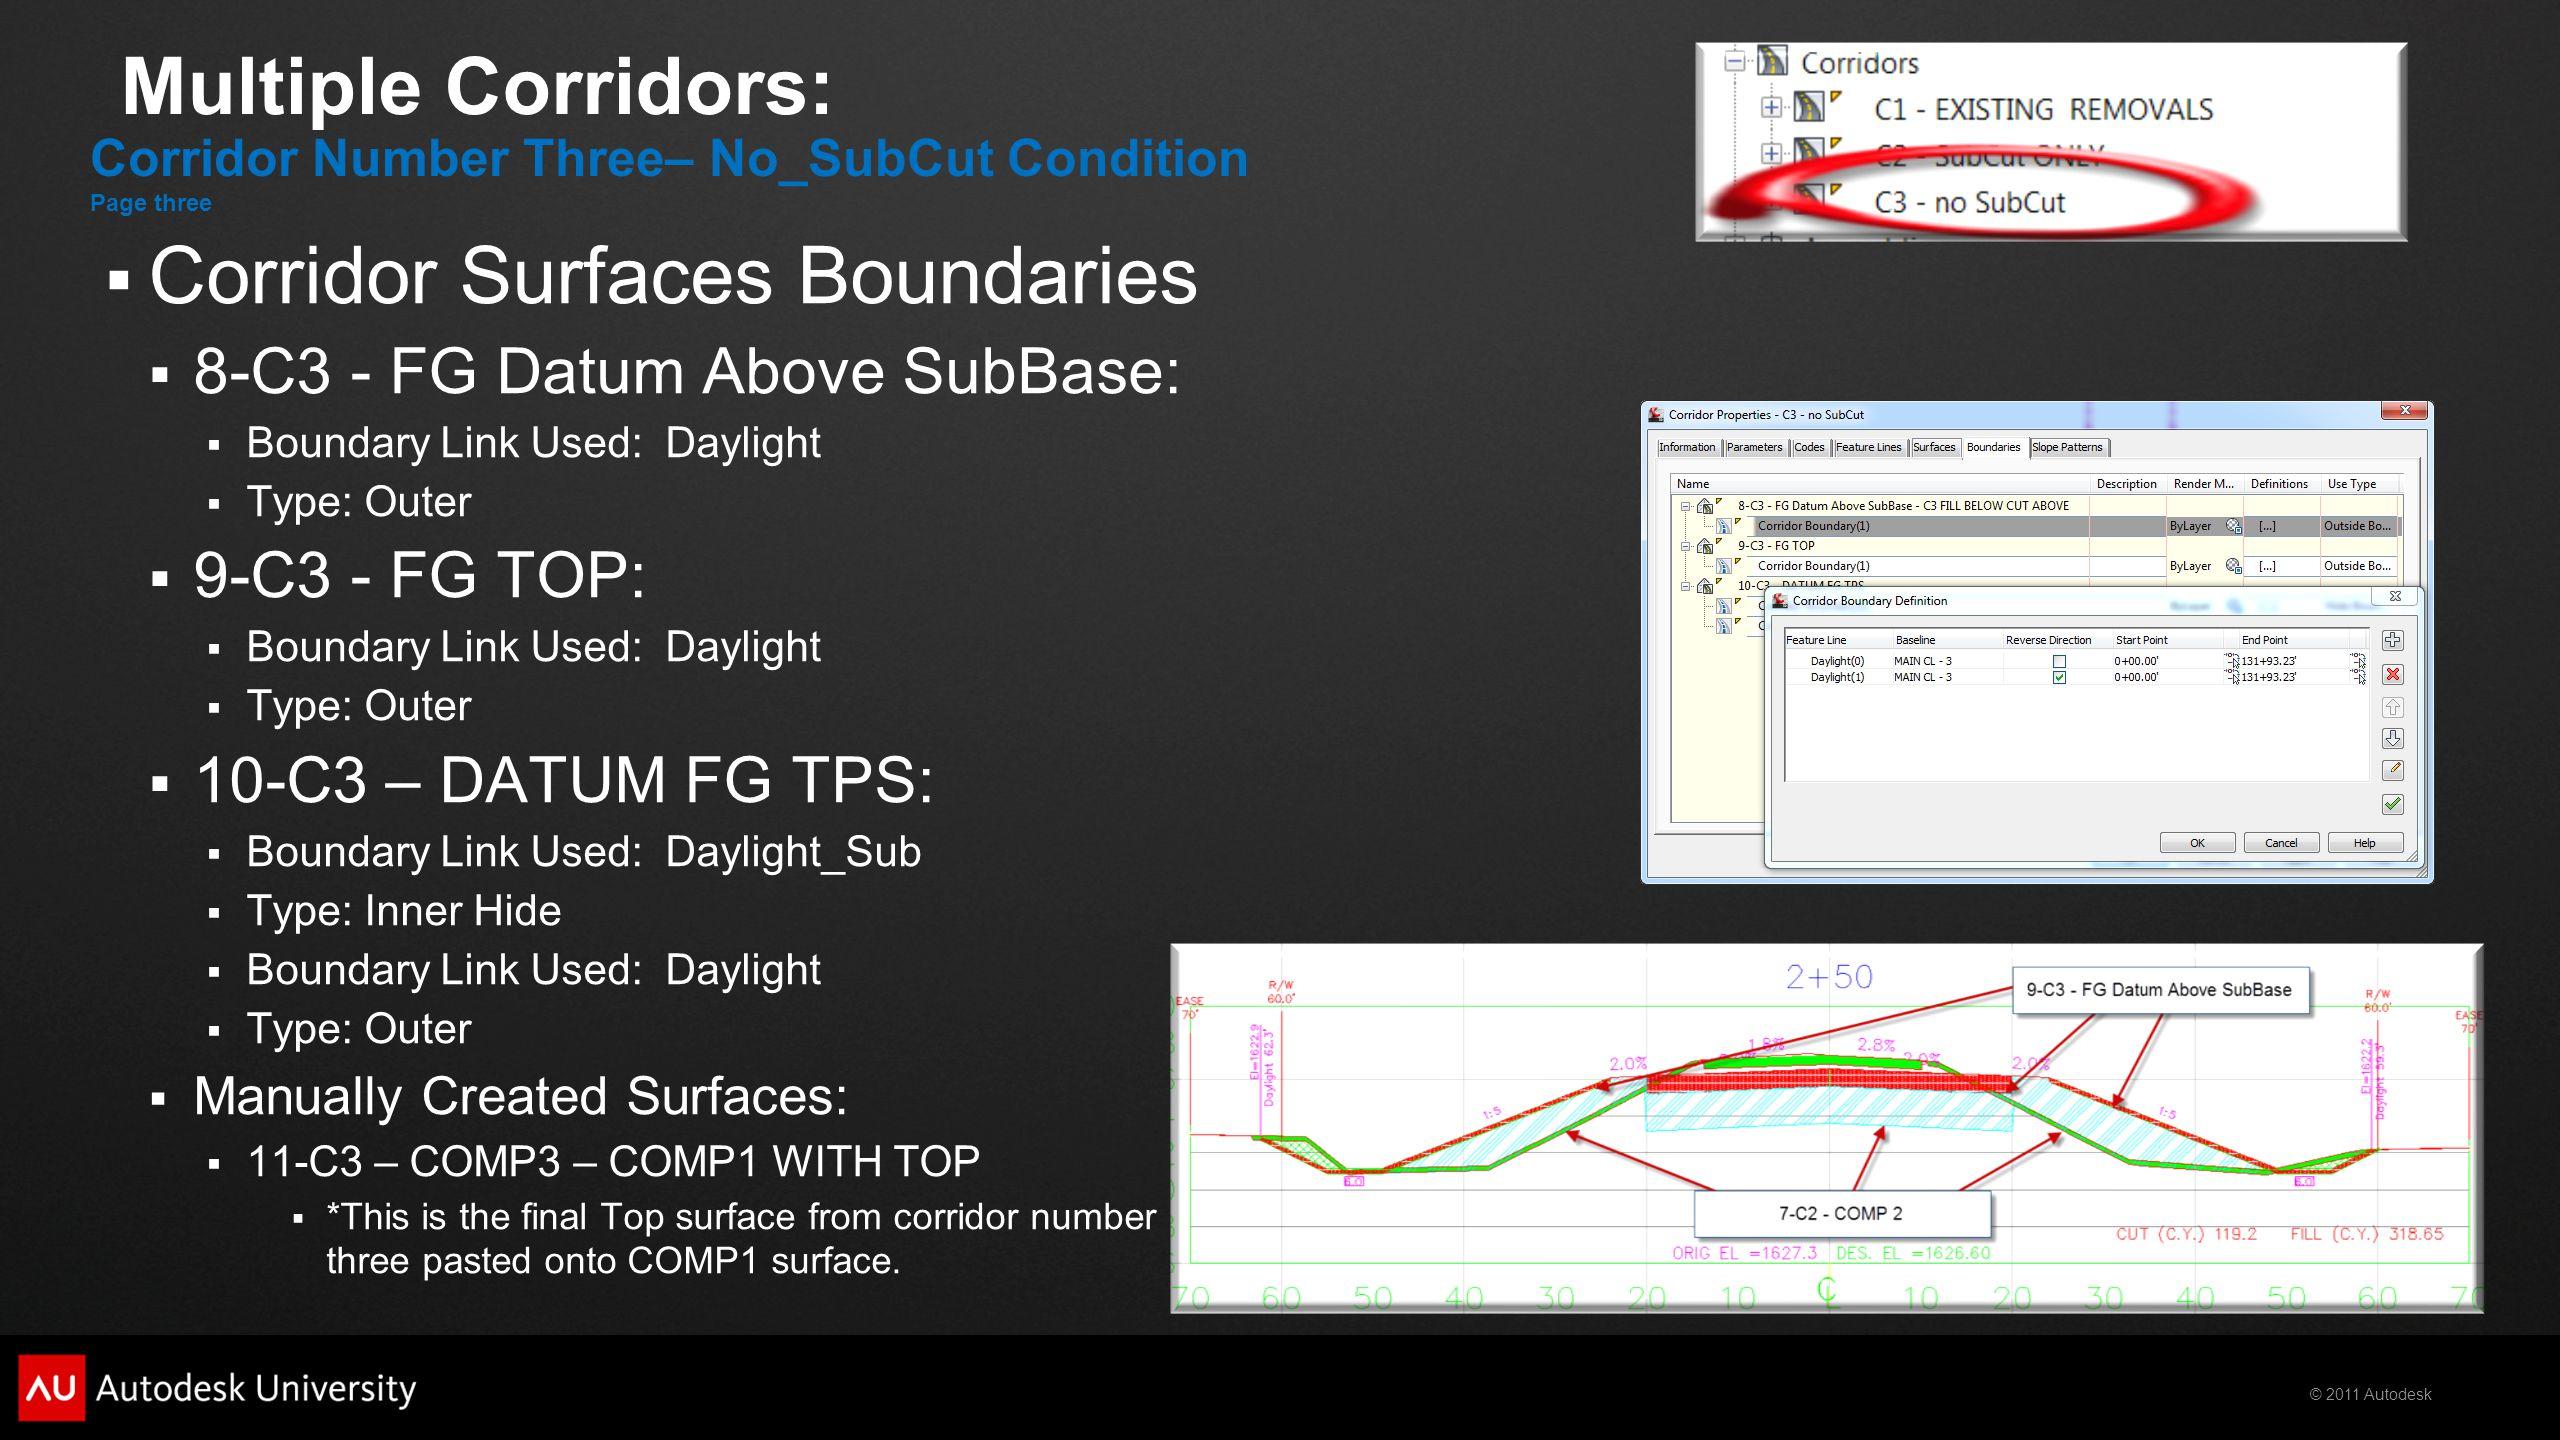 Corridor Surfaces Boundaries